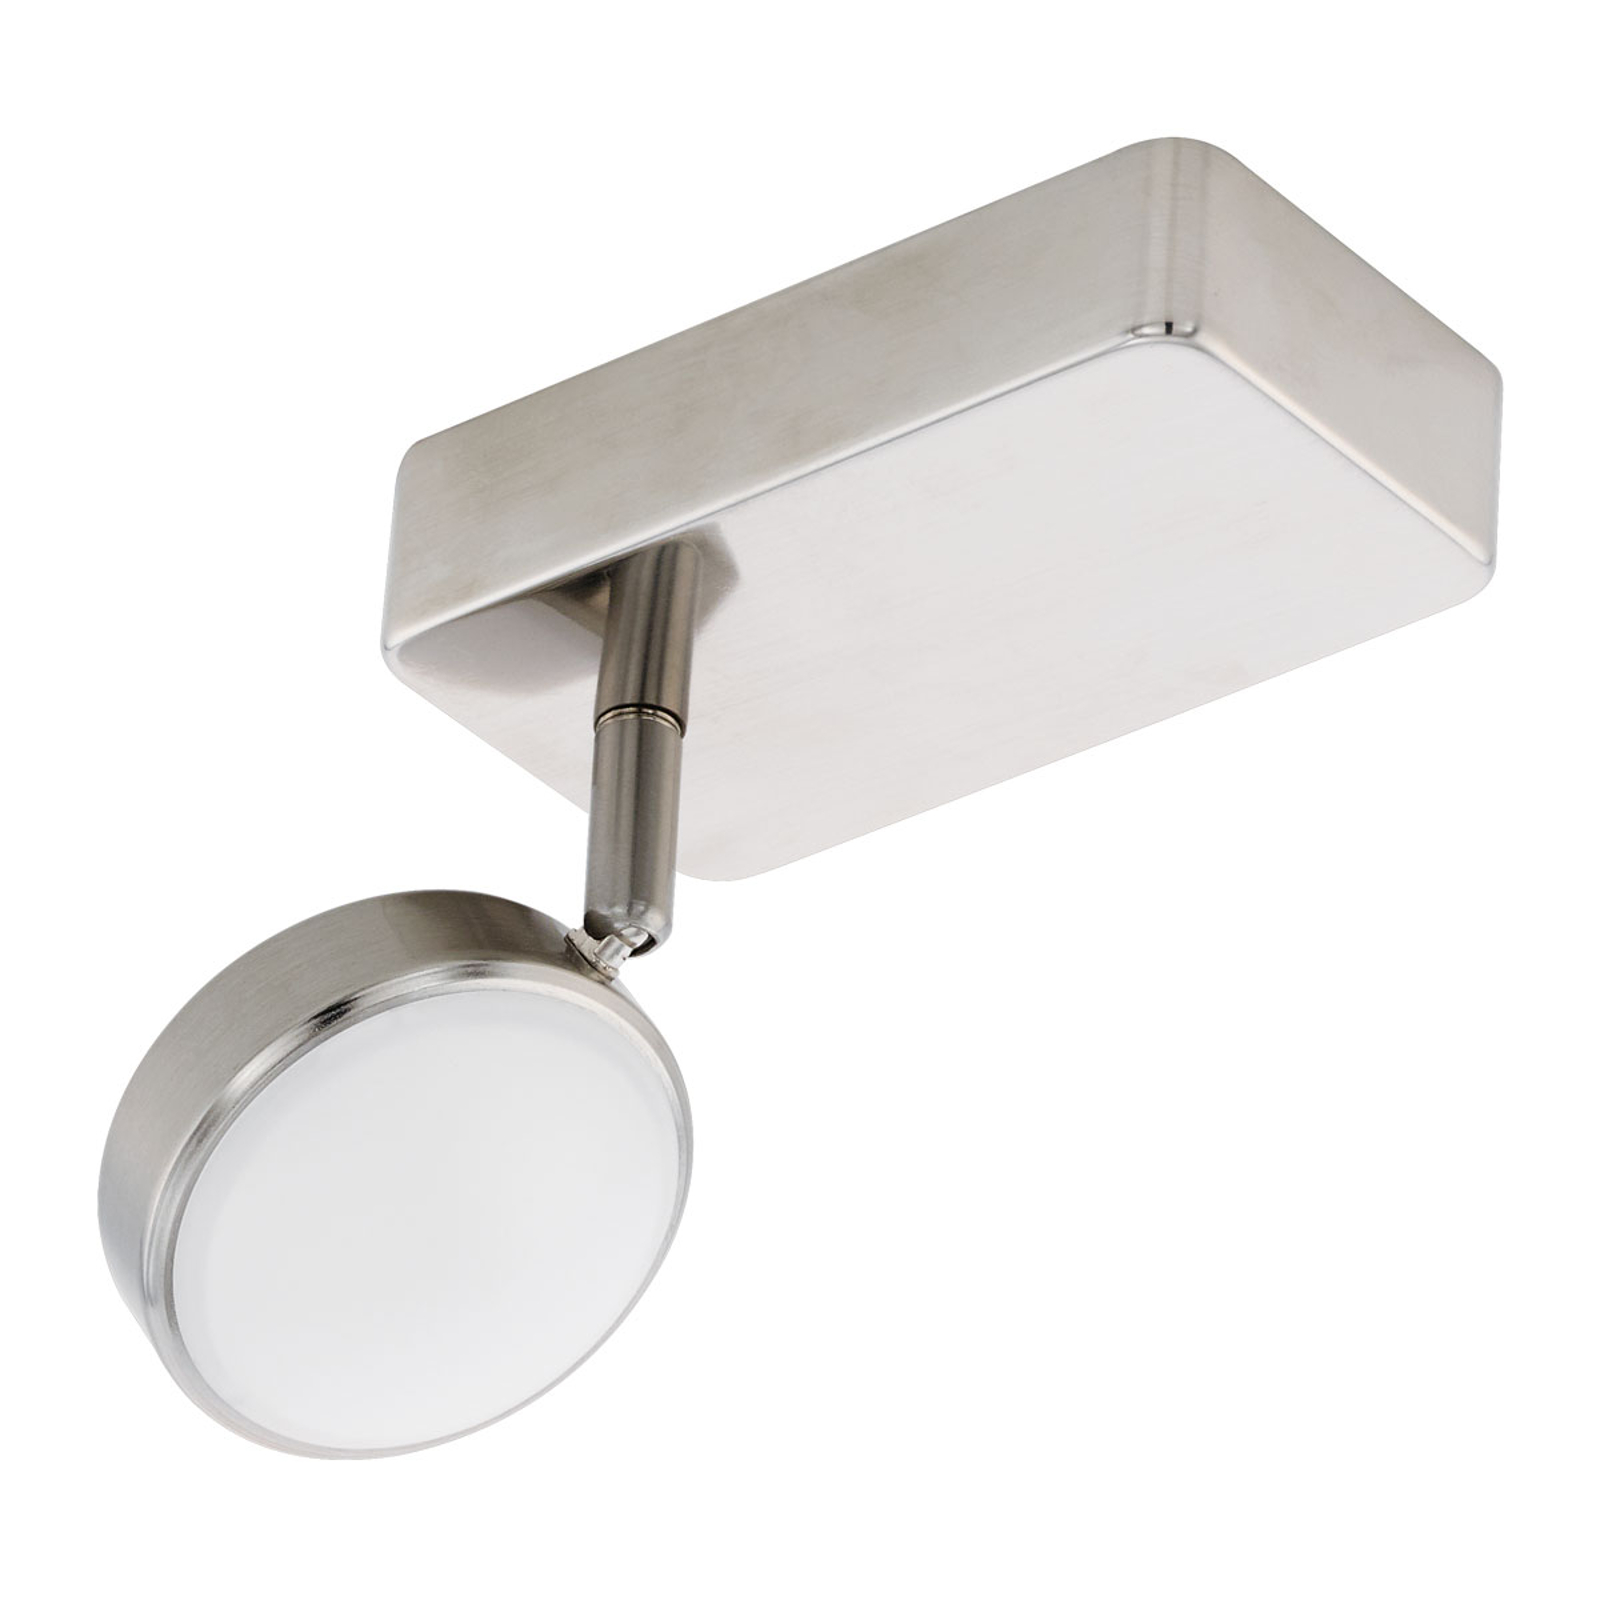 EGLO connect Corropoli-C spot sufitowy LED 1-pkt.